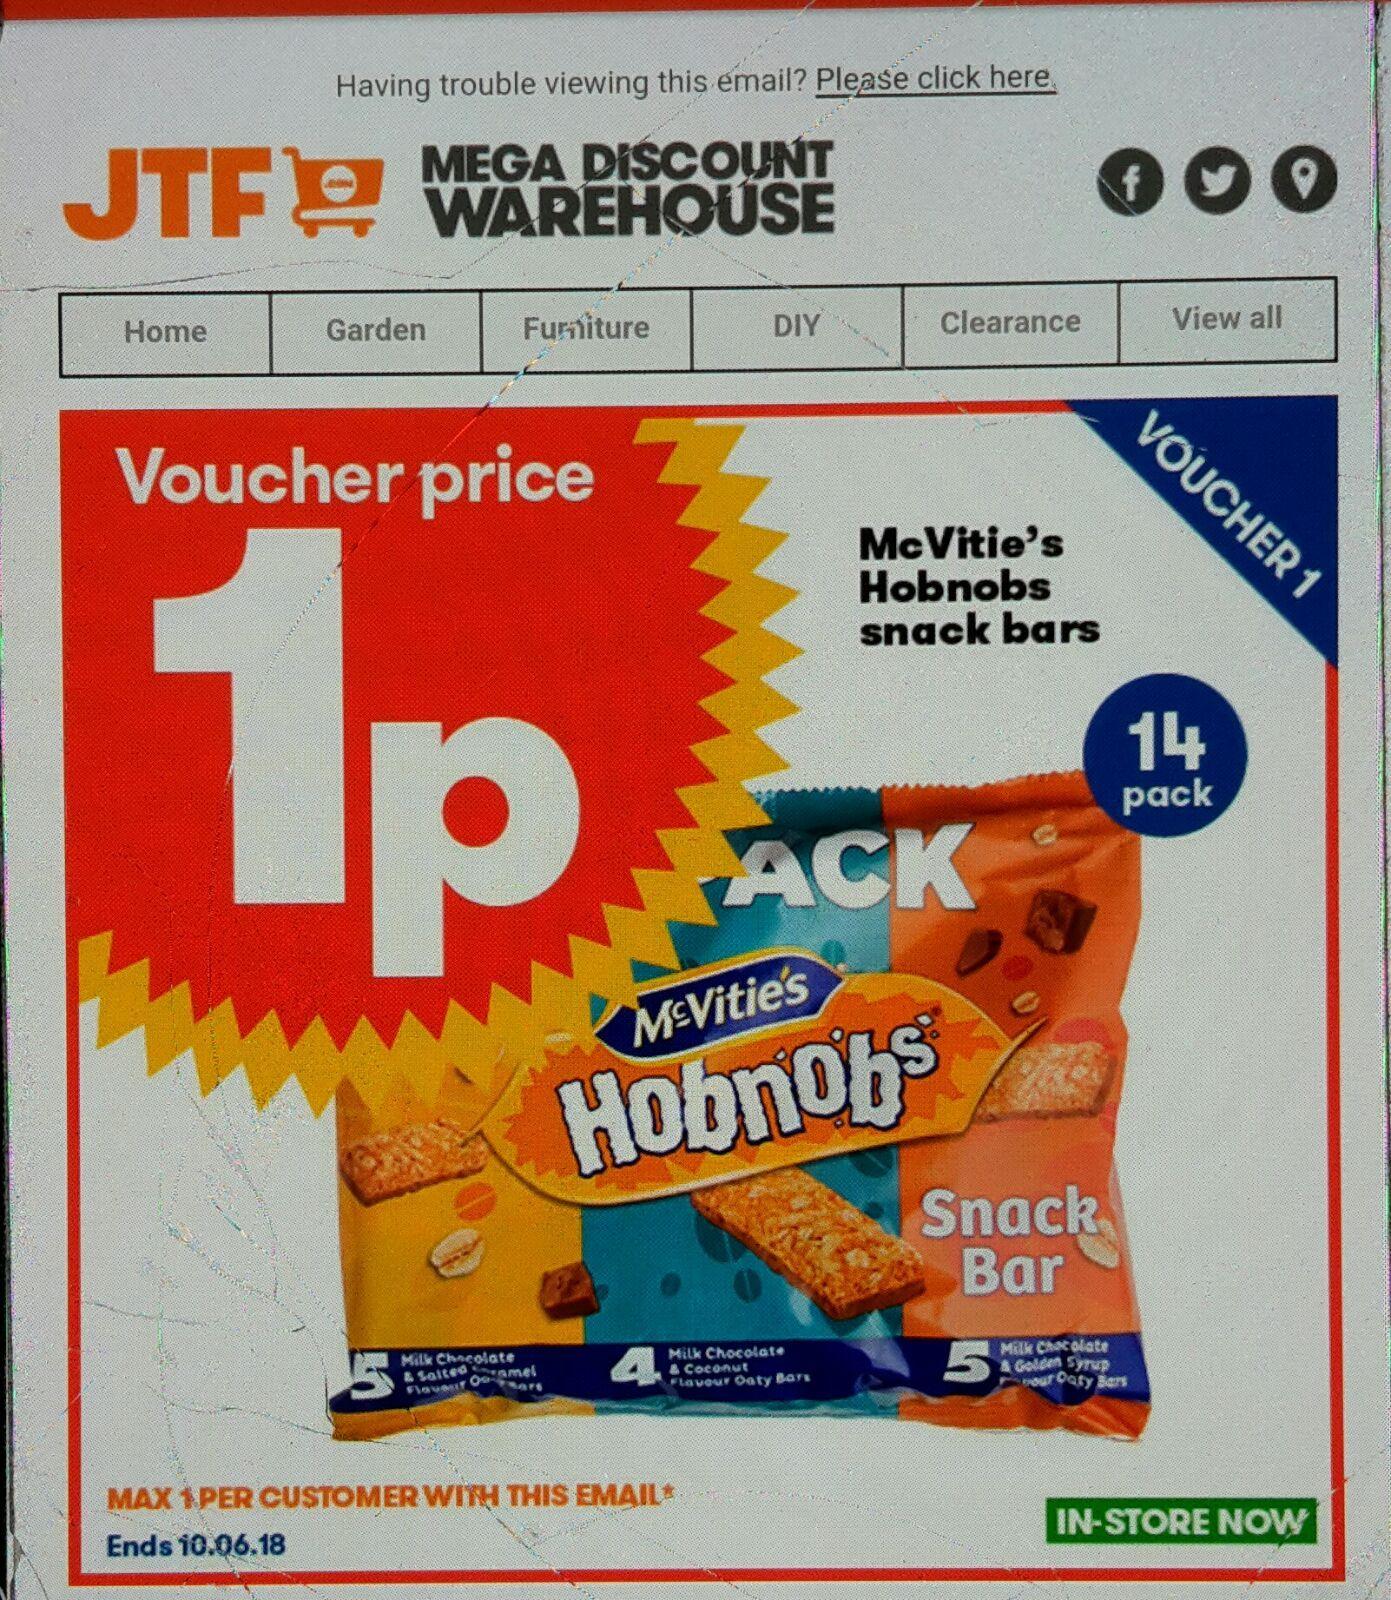 McVities Hobnobs snack bars 1p instore @ JTF